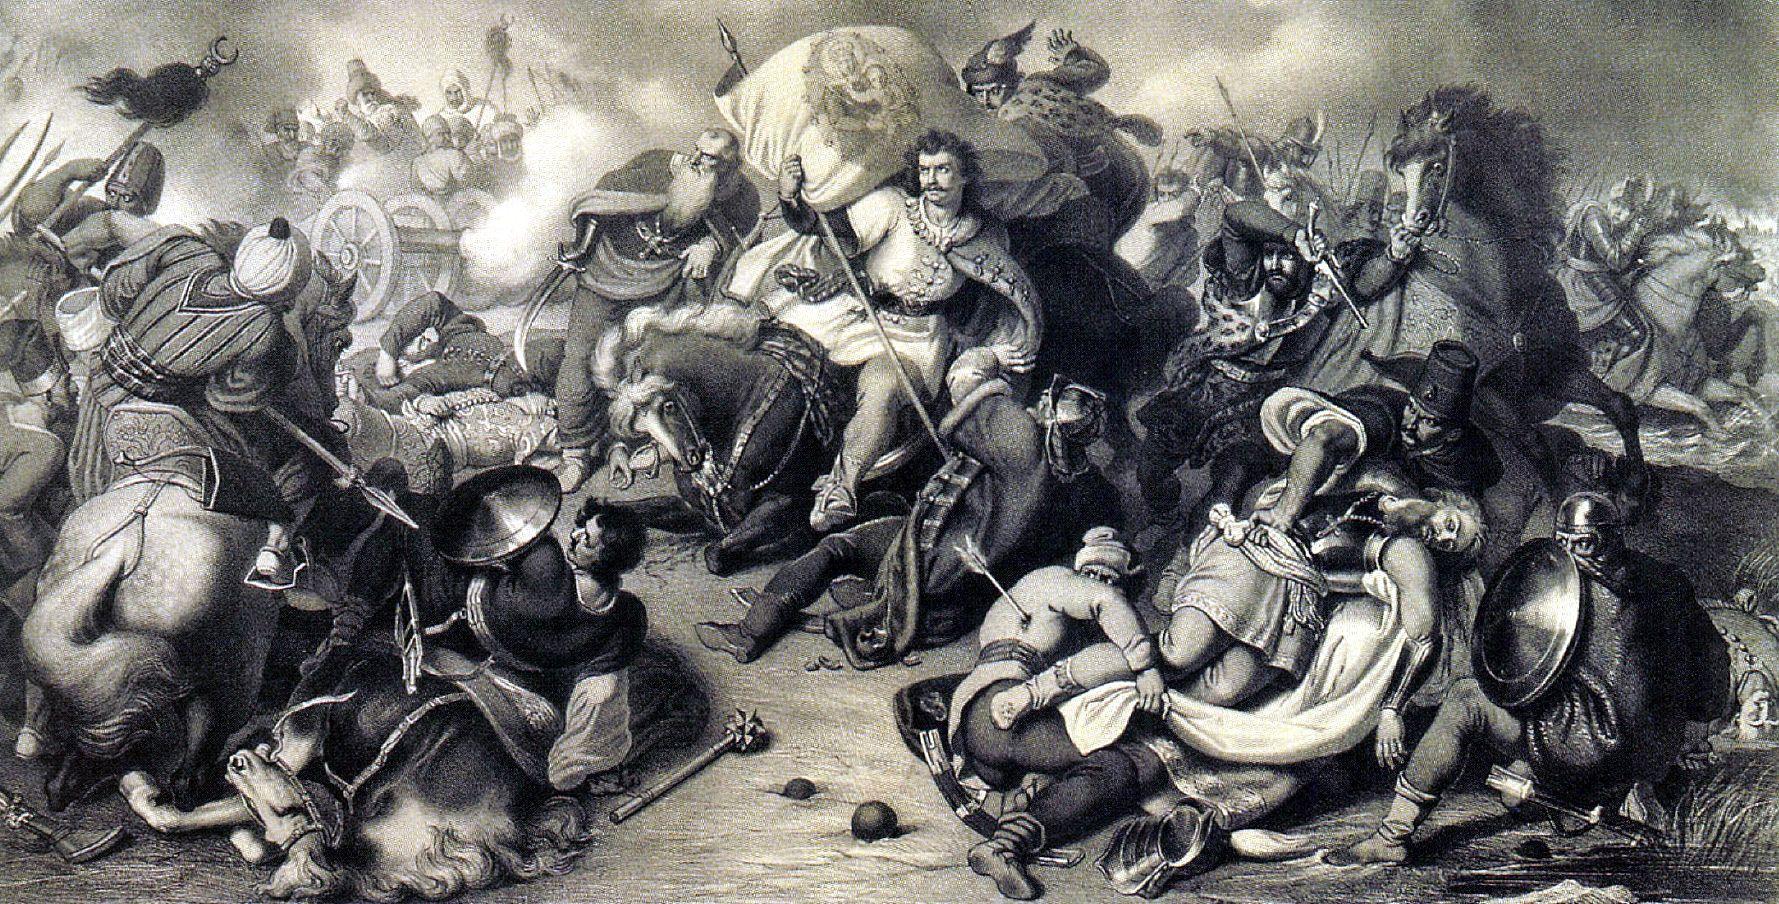 File:Grimm Battle of Mohács 1857.jpg